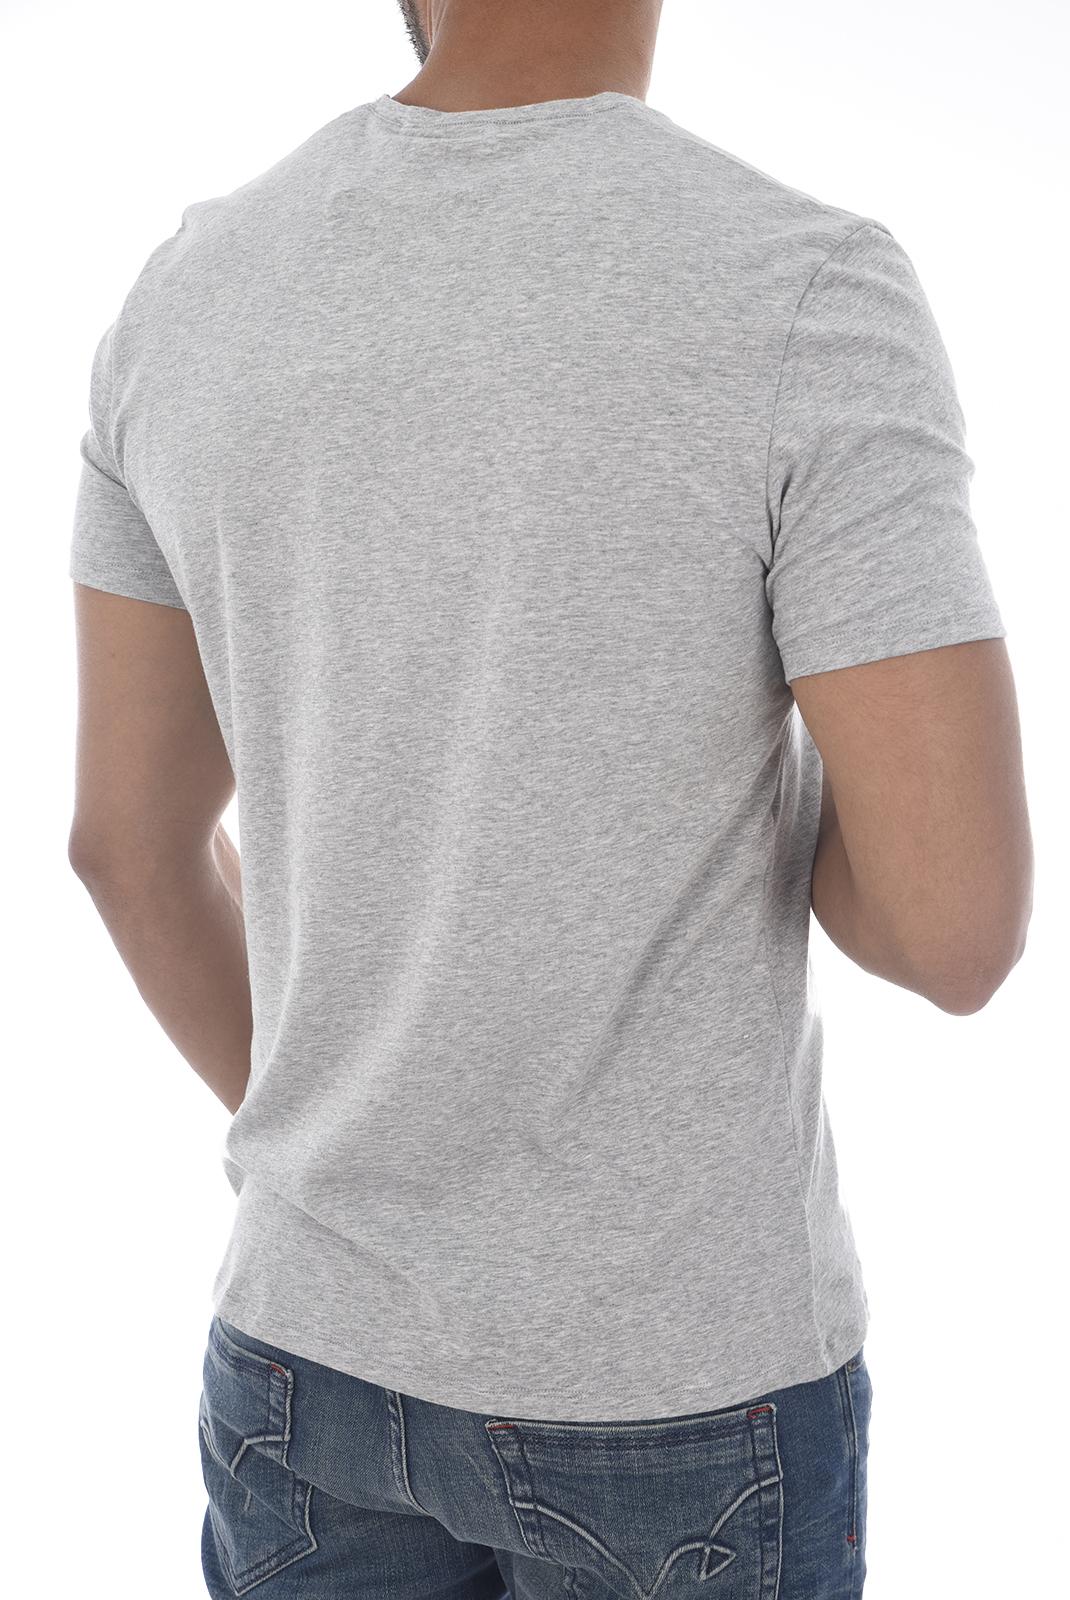 Tee-shirts  Fila 46065 026-GRIGIO MELANGE